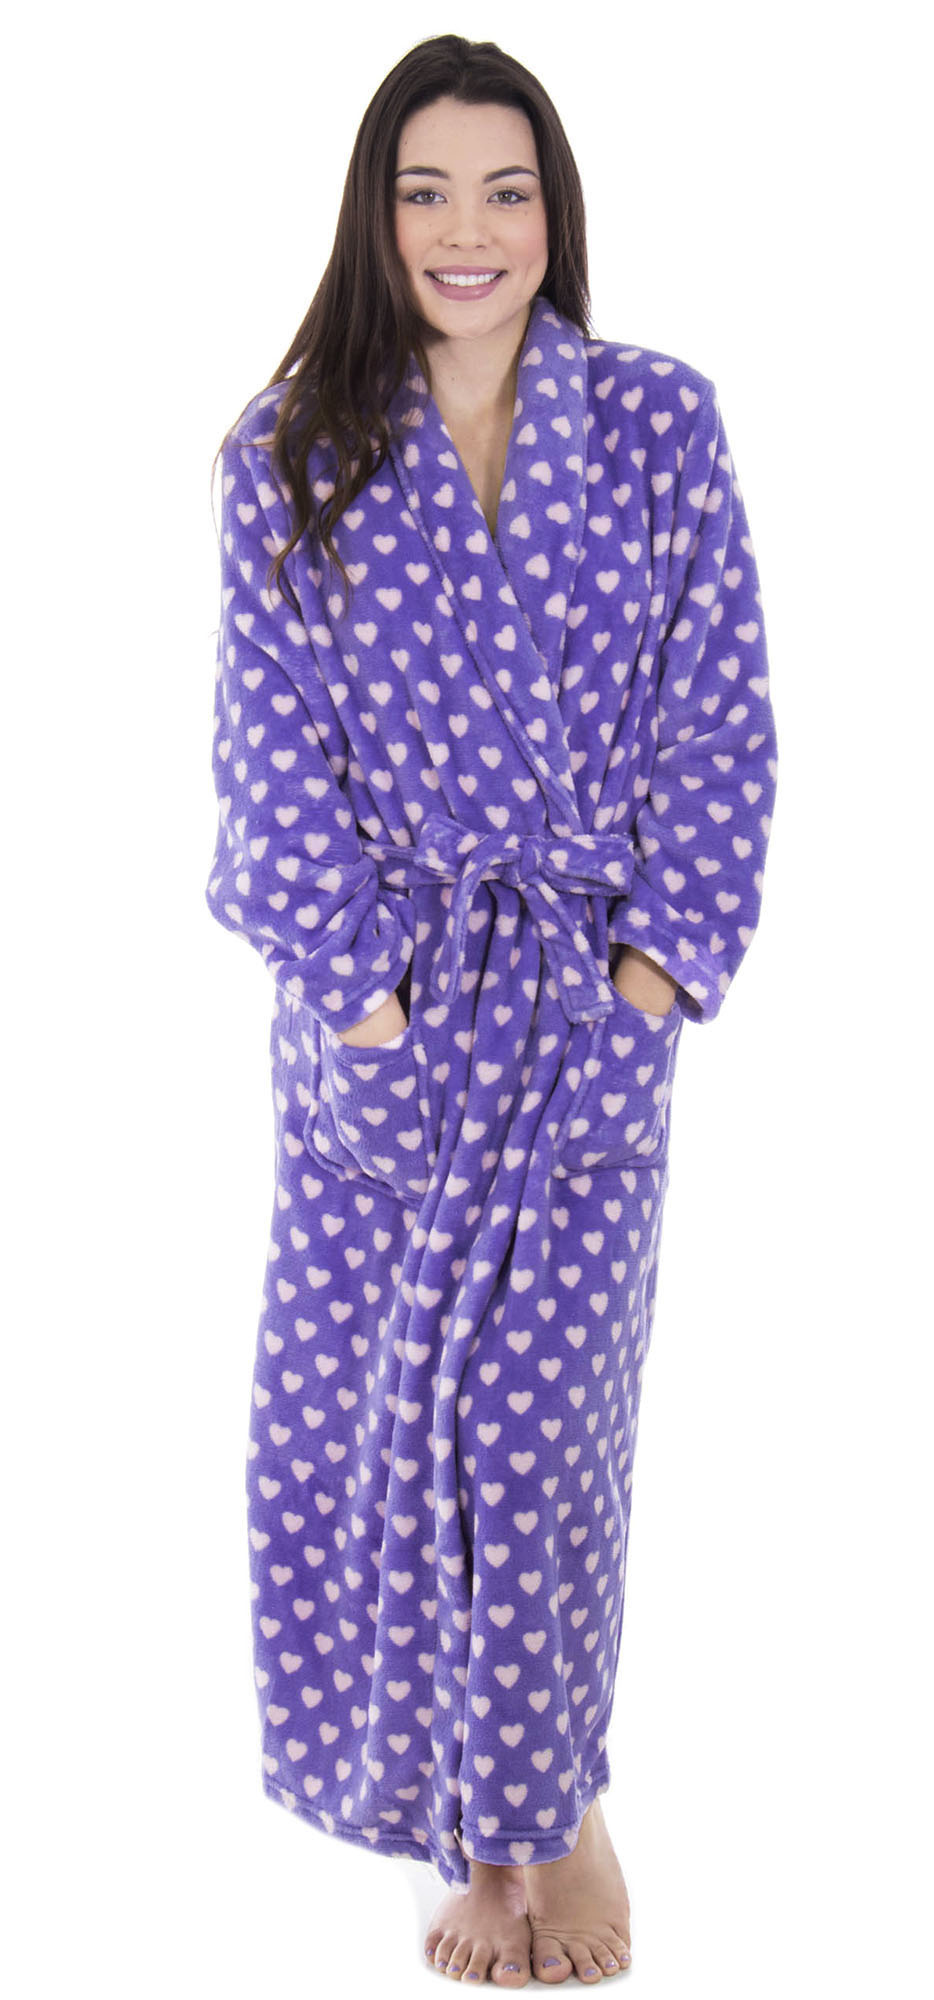 Simplicity Women Luxury Plush Velvet Bathrobe Shawl Collar Robe Sleepwear Housecoat Walmart Com Walmart Com